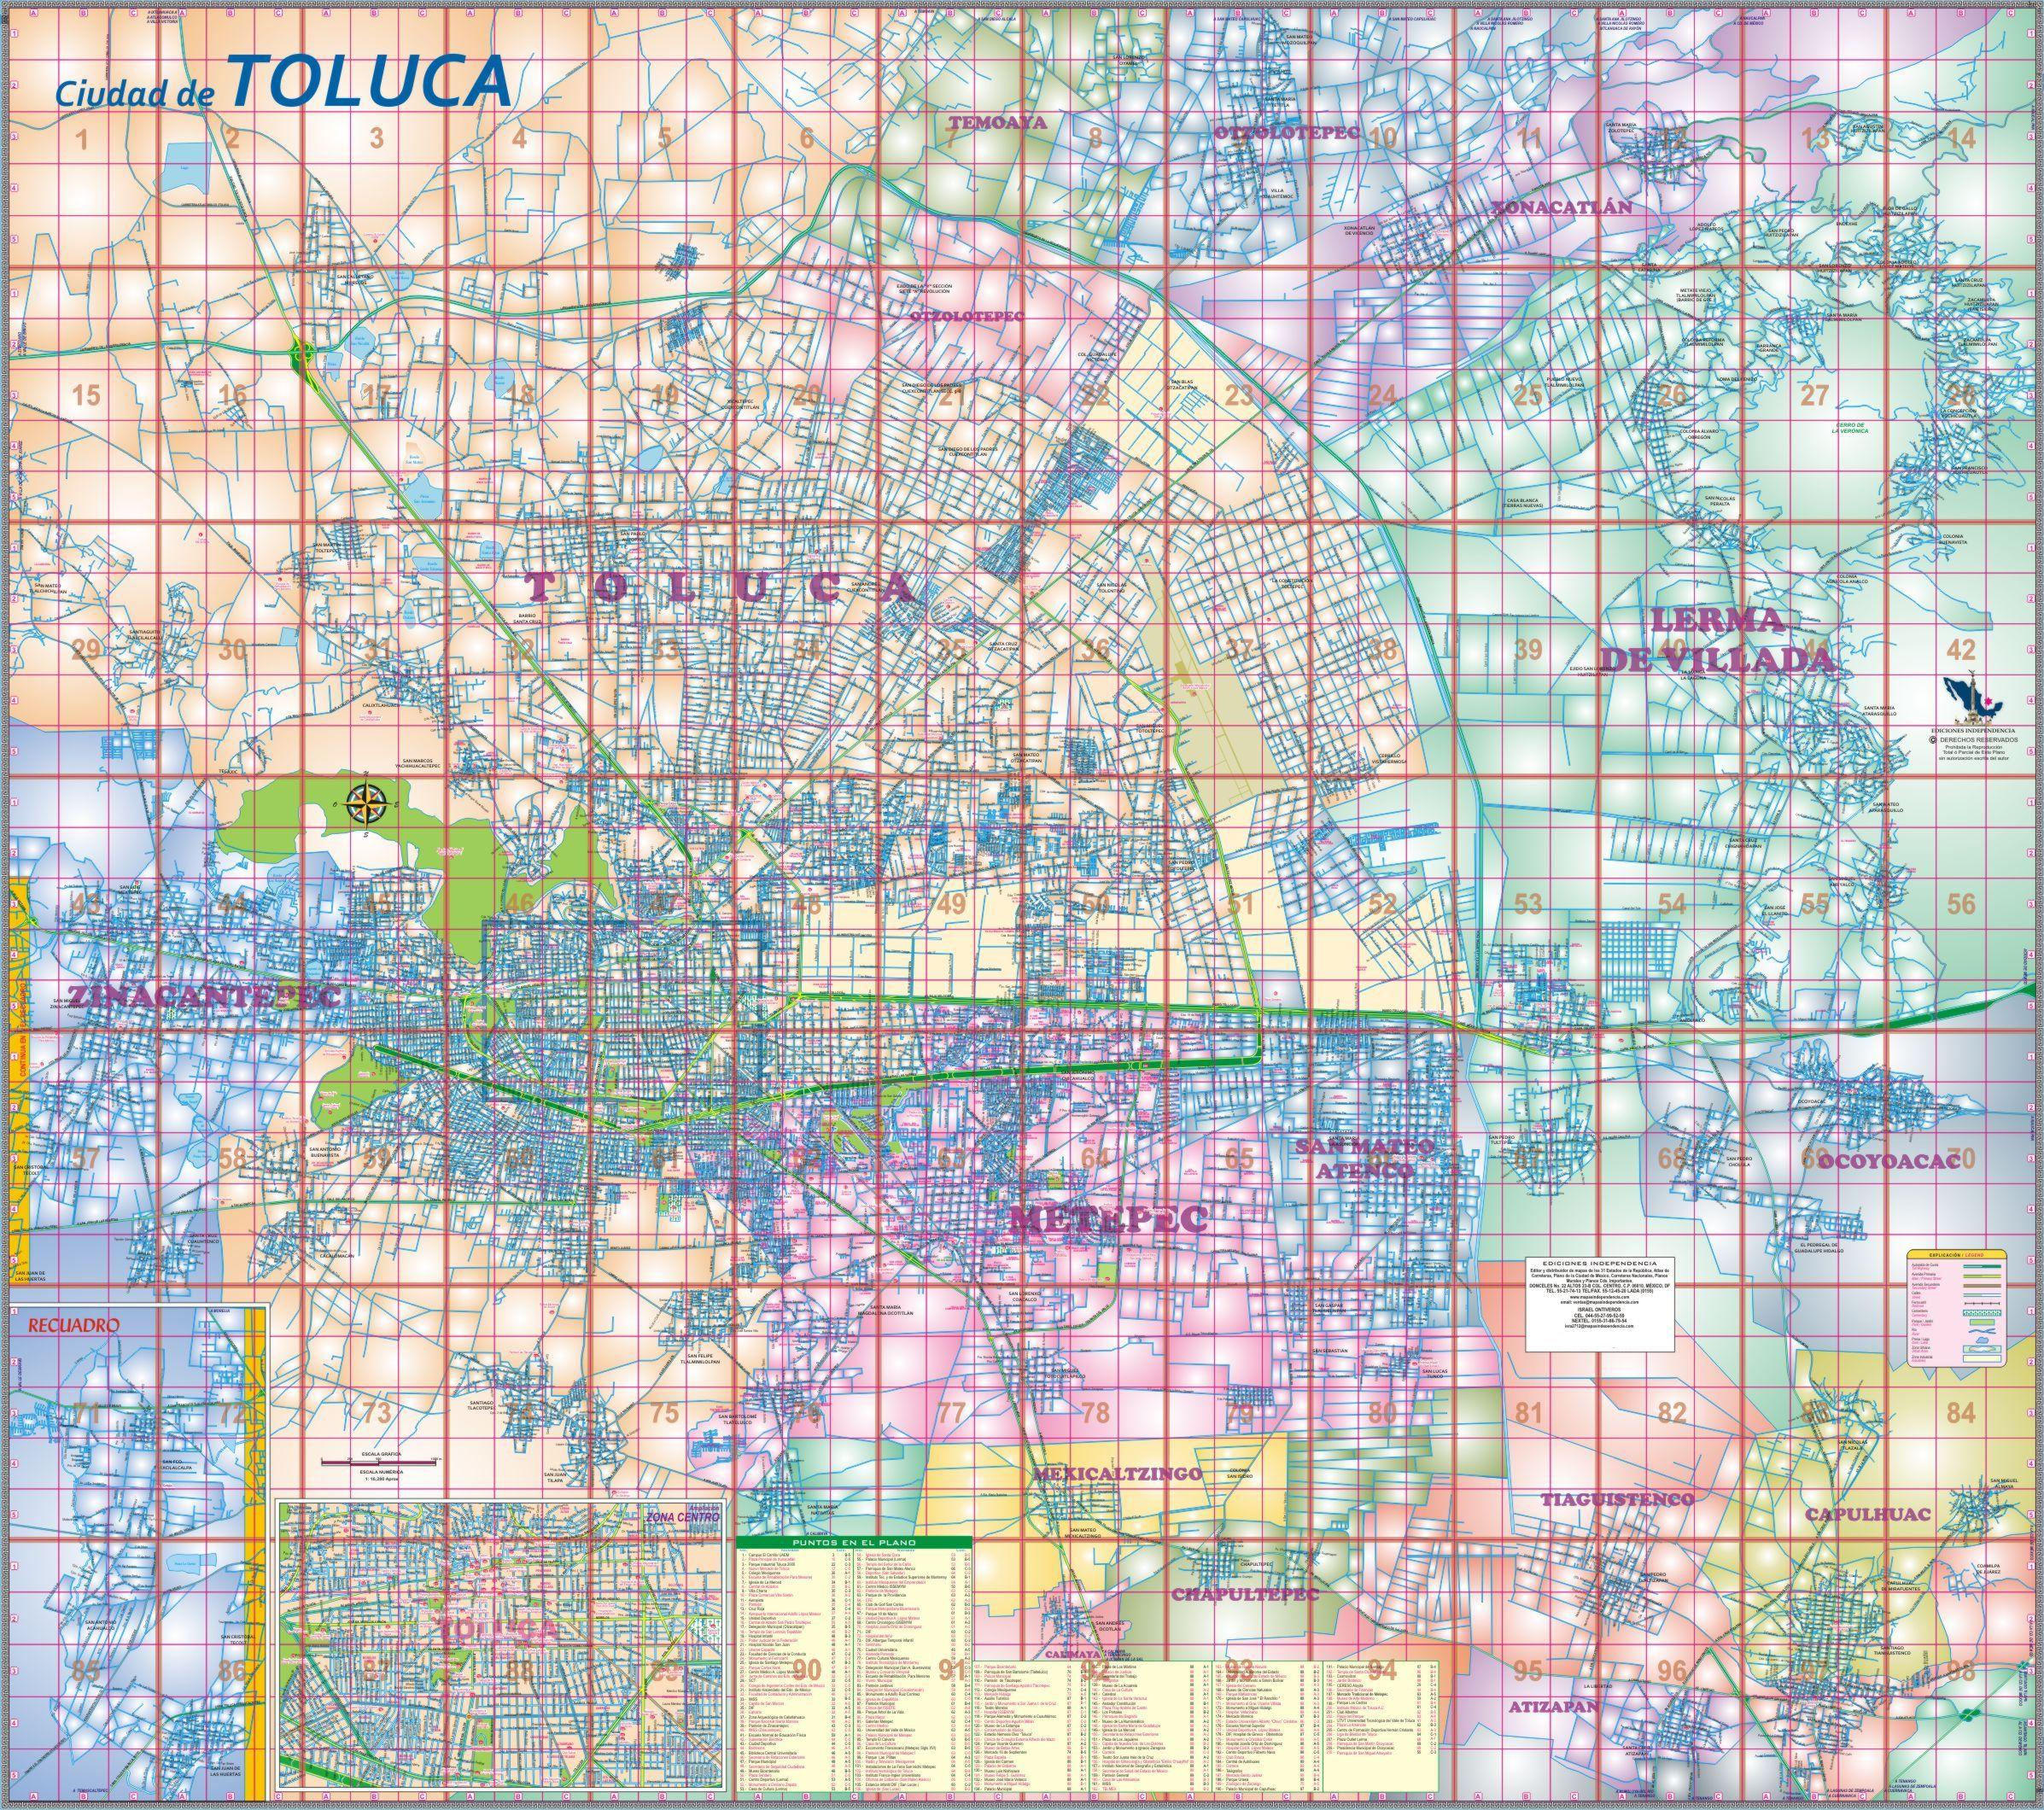 Planisferio mapas independencia in december 2017 for Mural de prepa 1 toluca